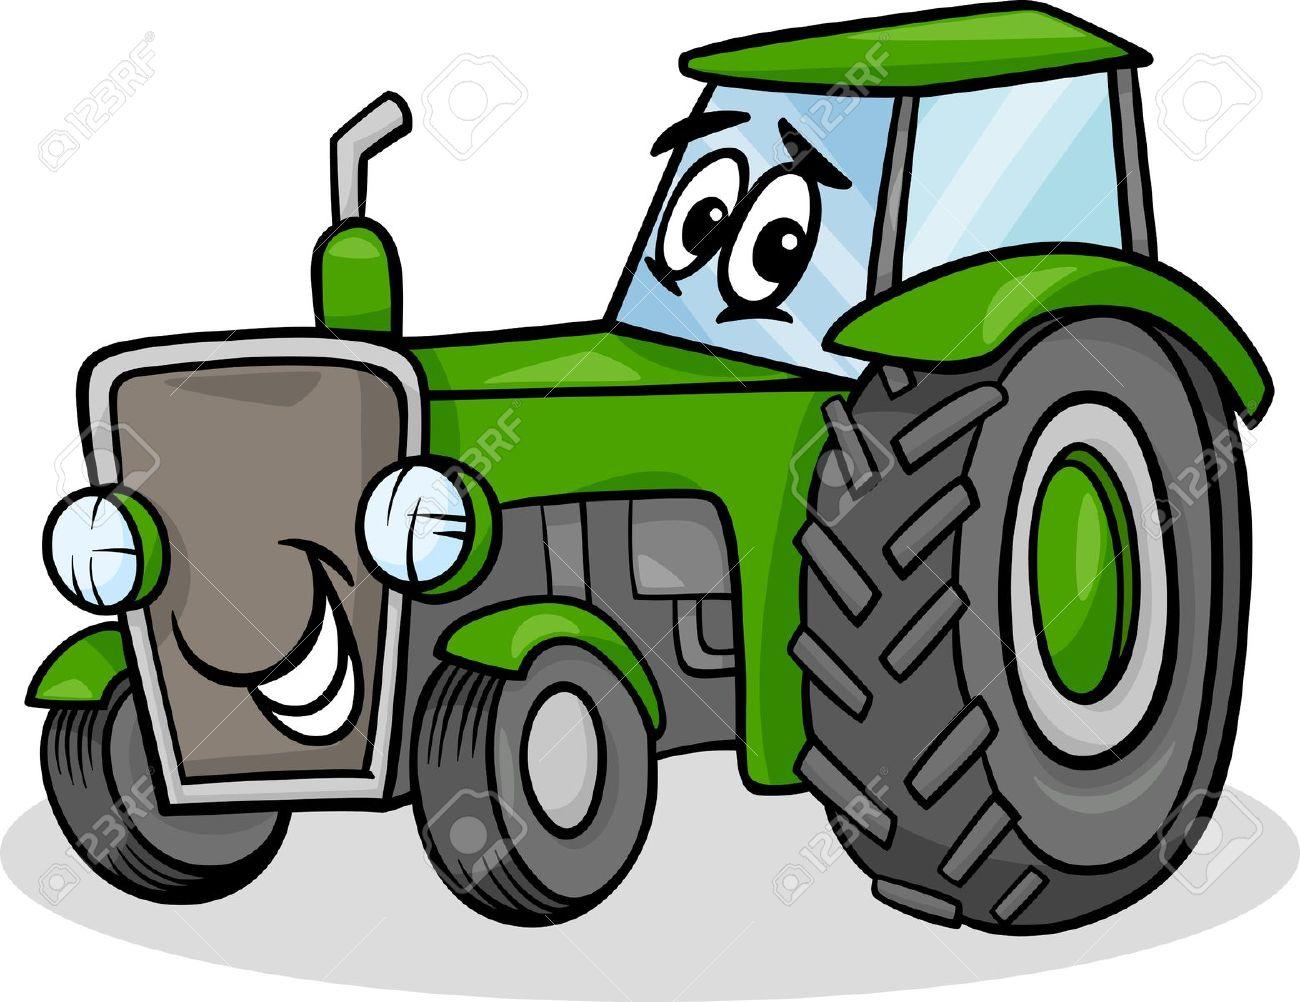 1000+ images about Traktor on Pinterest.